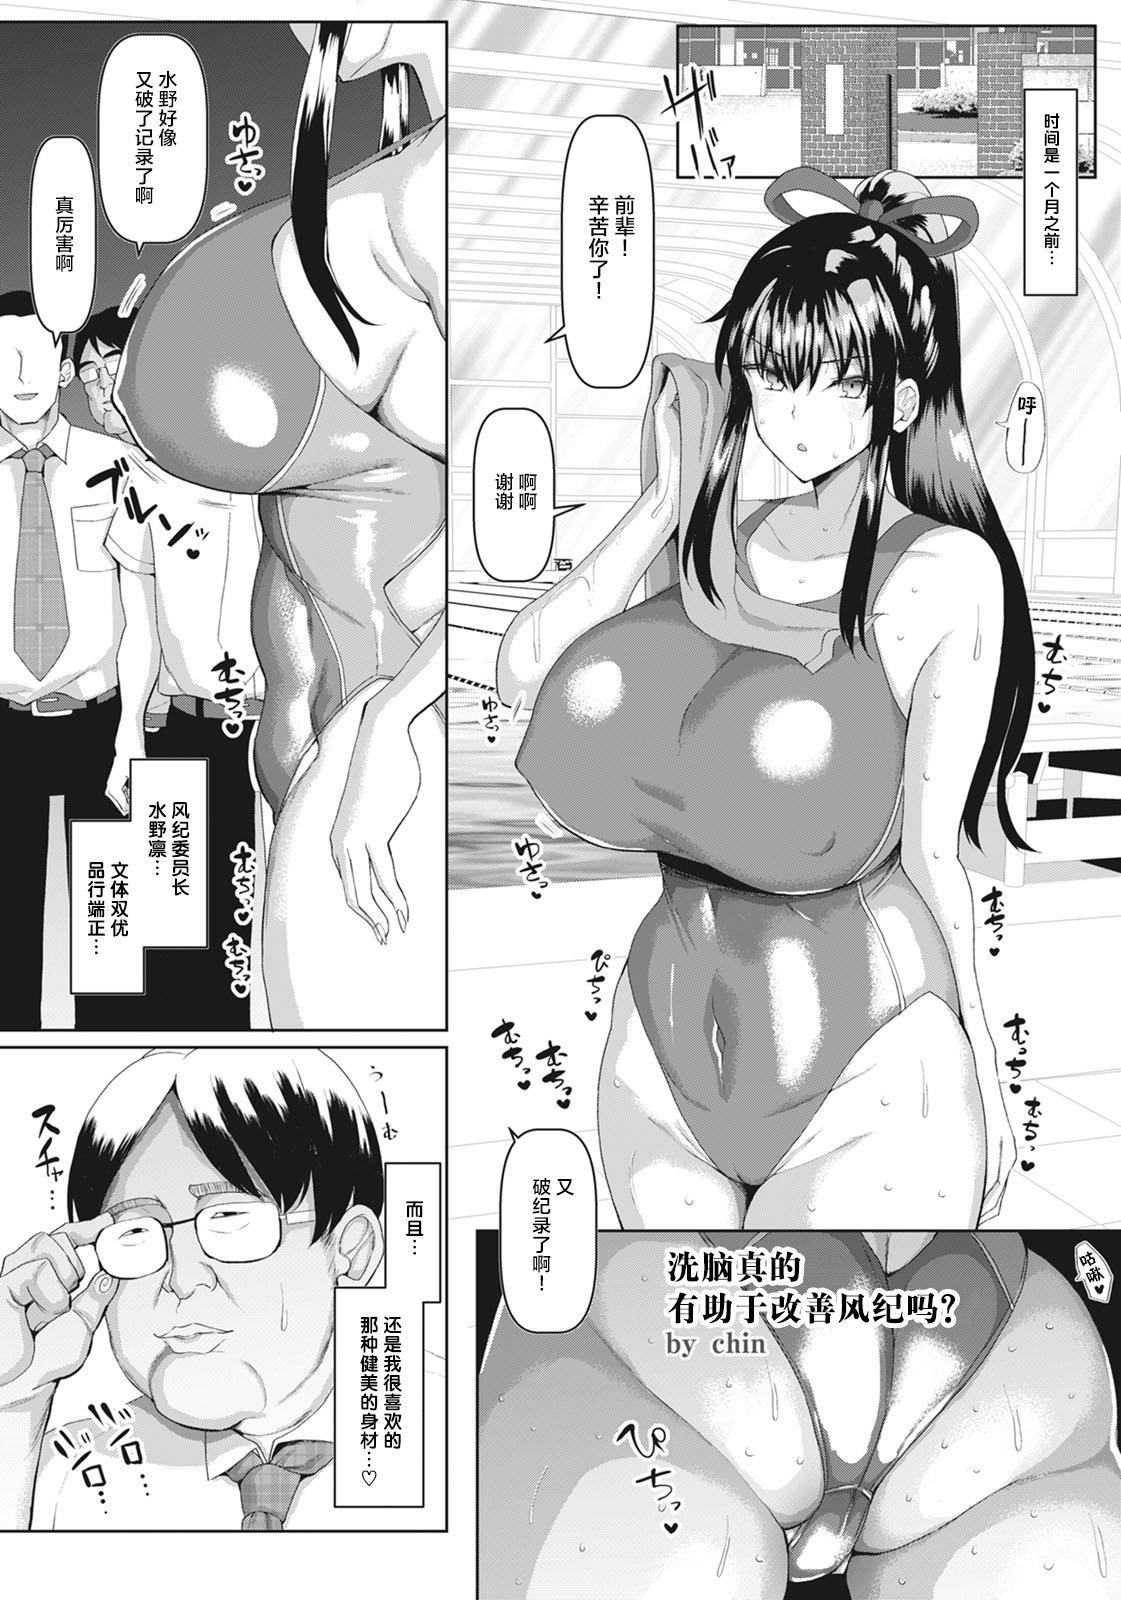 [chin] Fuuki no Midare ni Sennou ga Kikutte Hontou?   I Can Brainwash A Girl Into Violating Public Morals!? (ANGEL Club 2020-11)[Chinese]【不可视汉化】 5